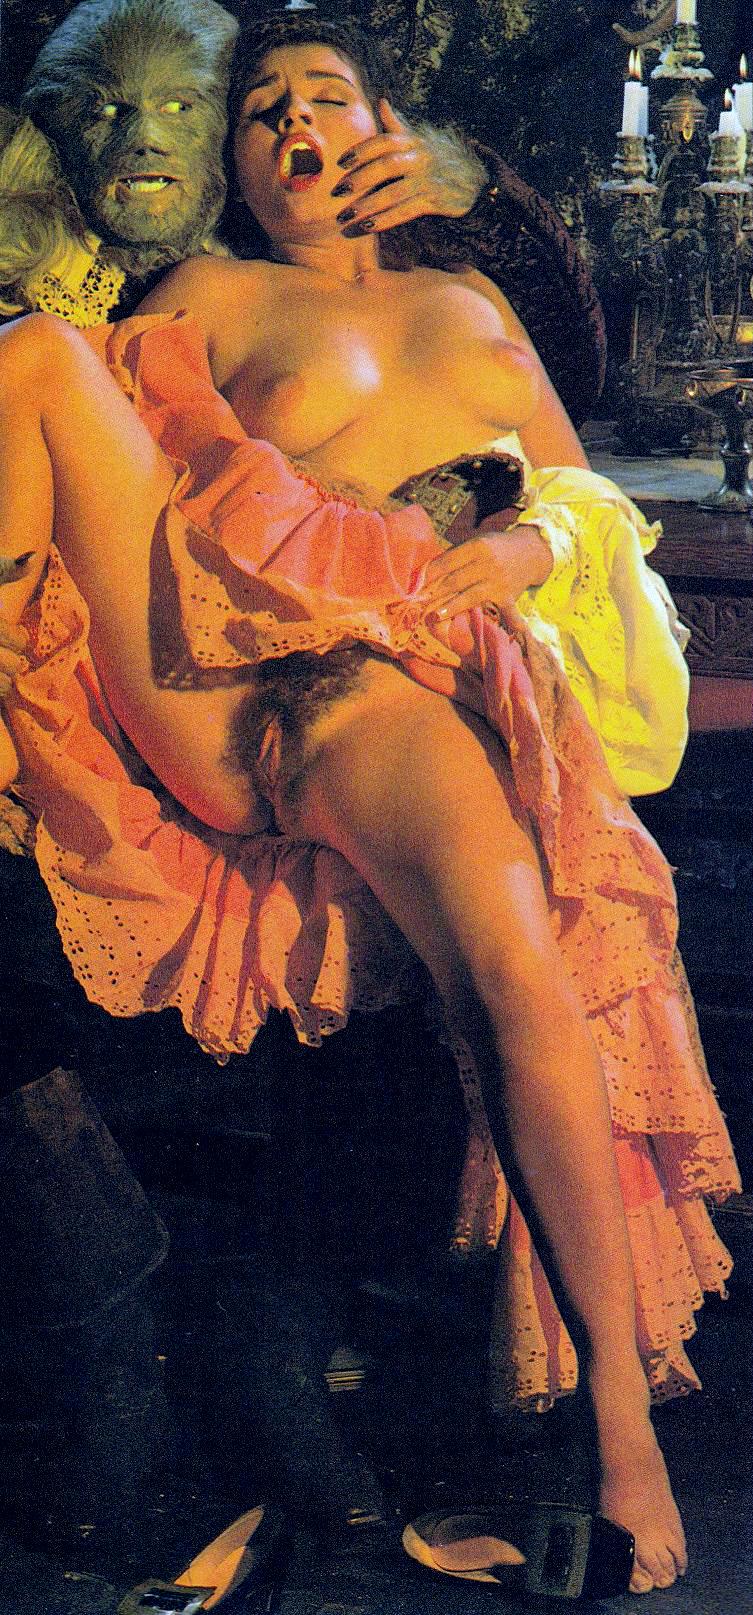 Yolanda Lancaster Hustler Magazine 1981 05.jpg